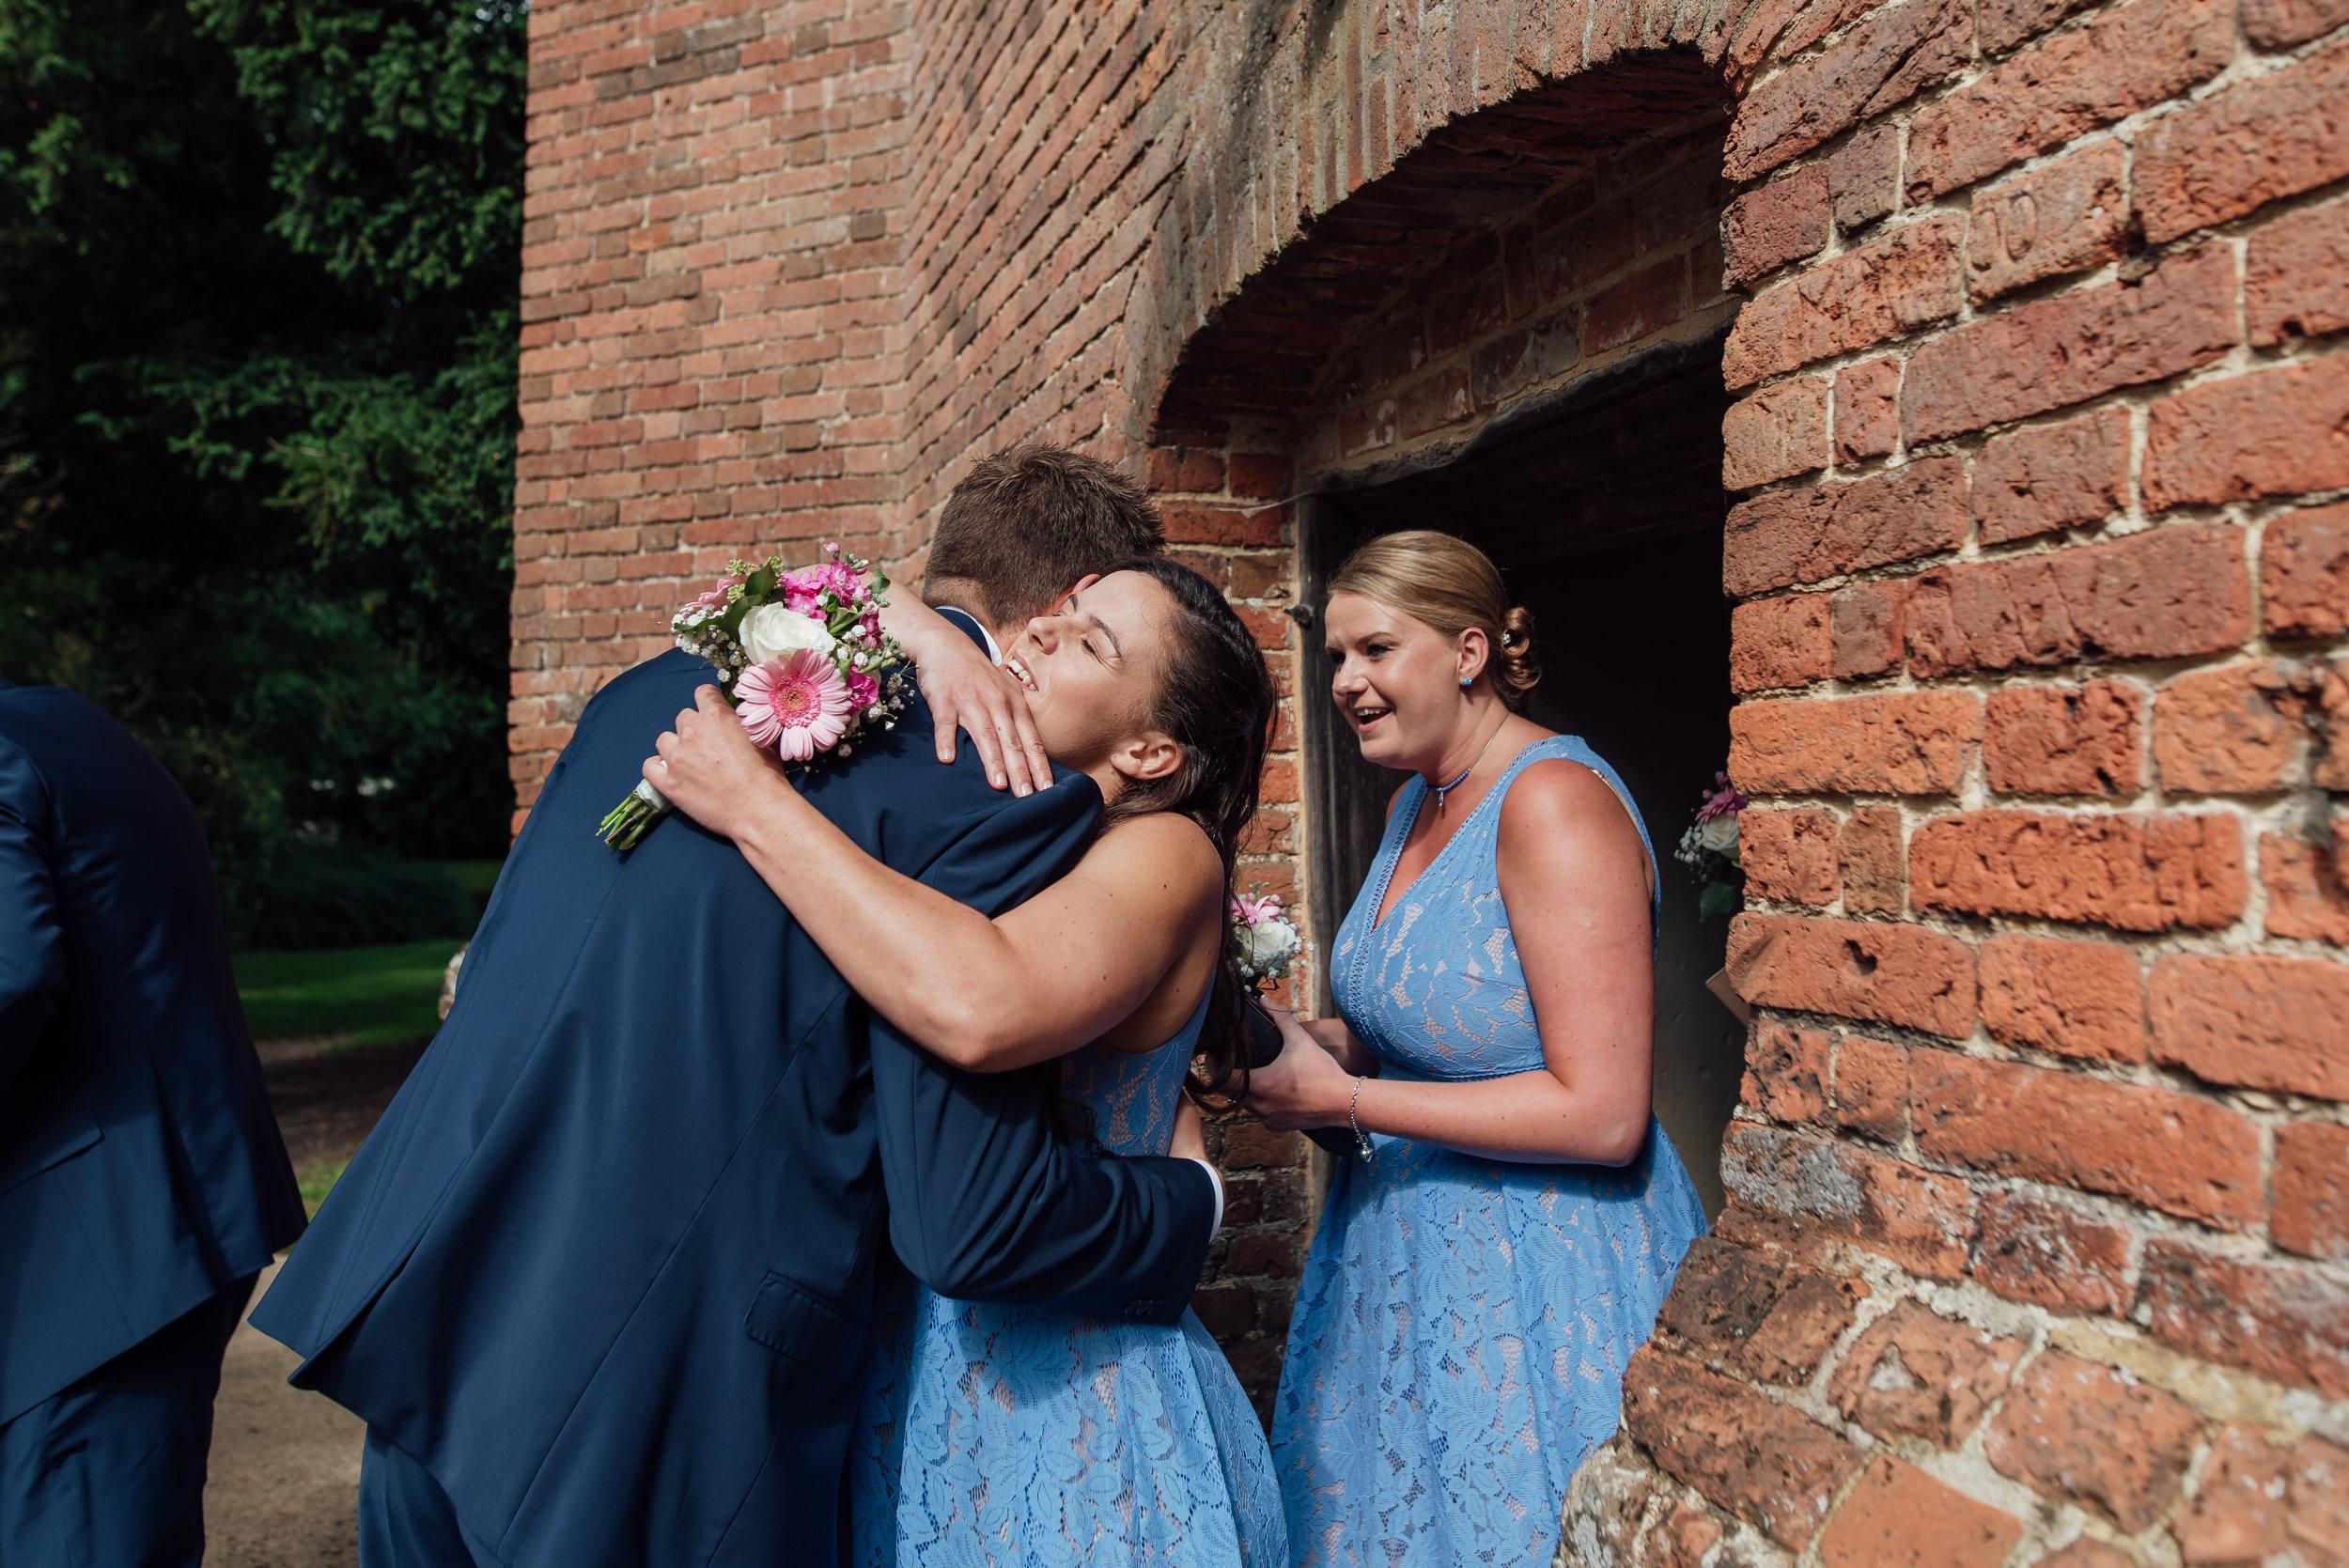 bridesmaid-hugging-groom / rotherwick-village-hall-wedding / Amy-james-photography / wedding-photographer-hampshire